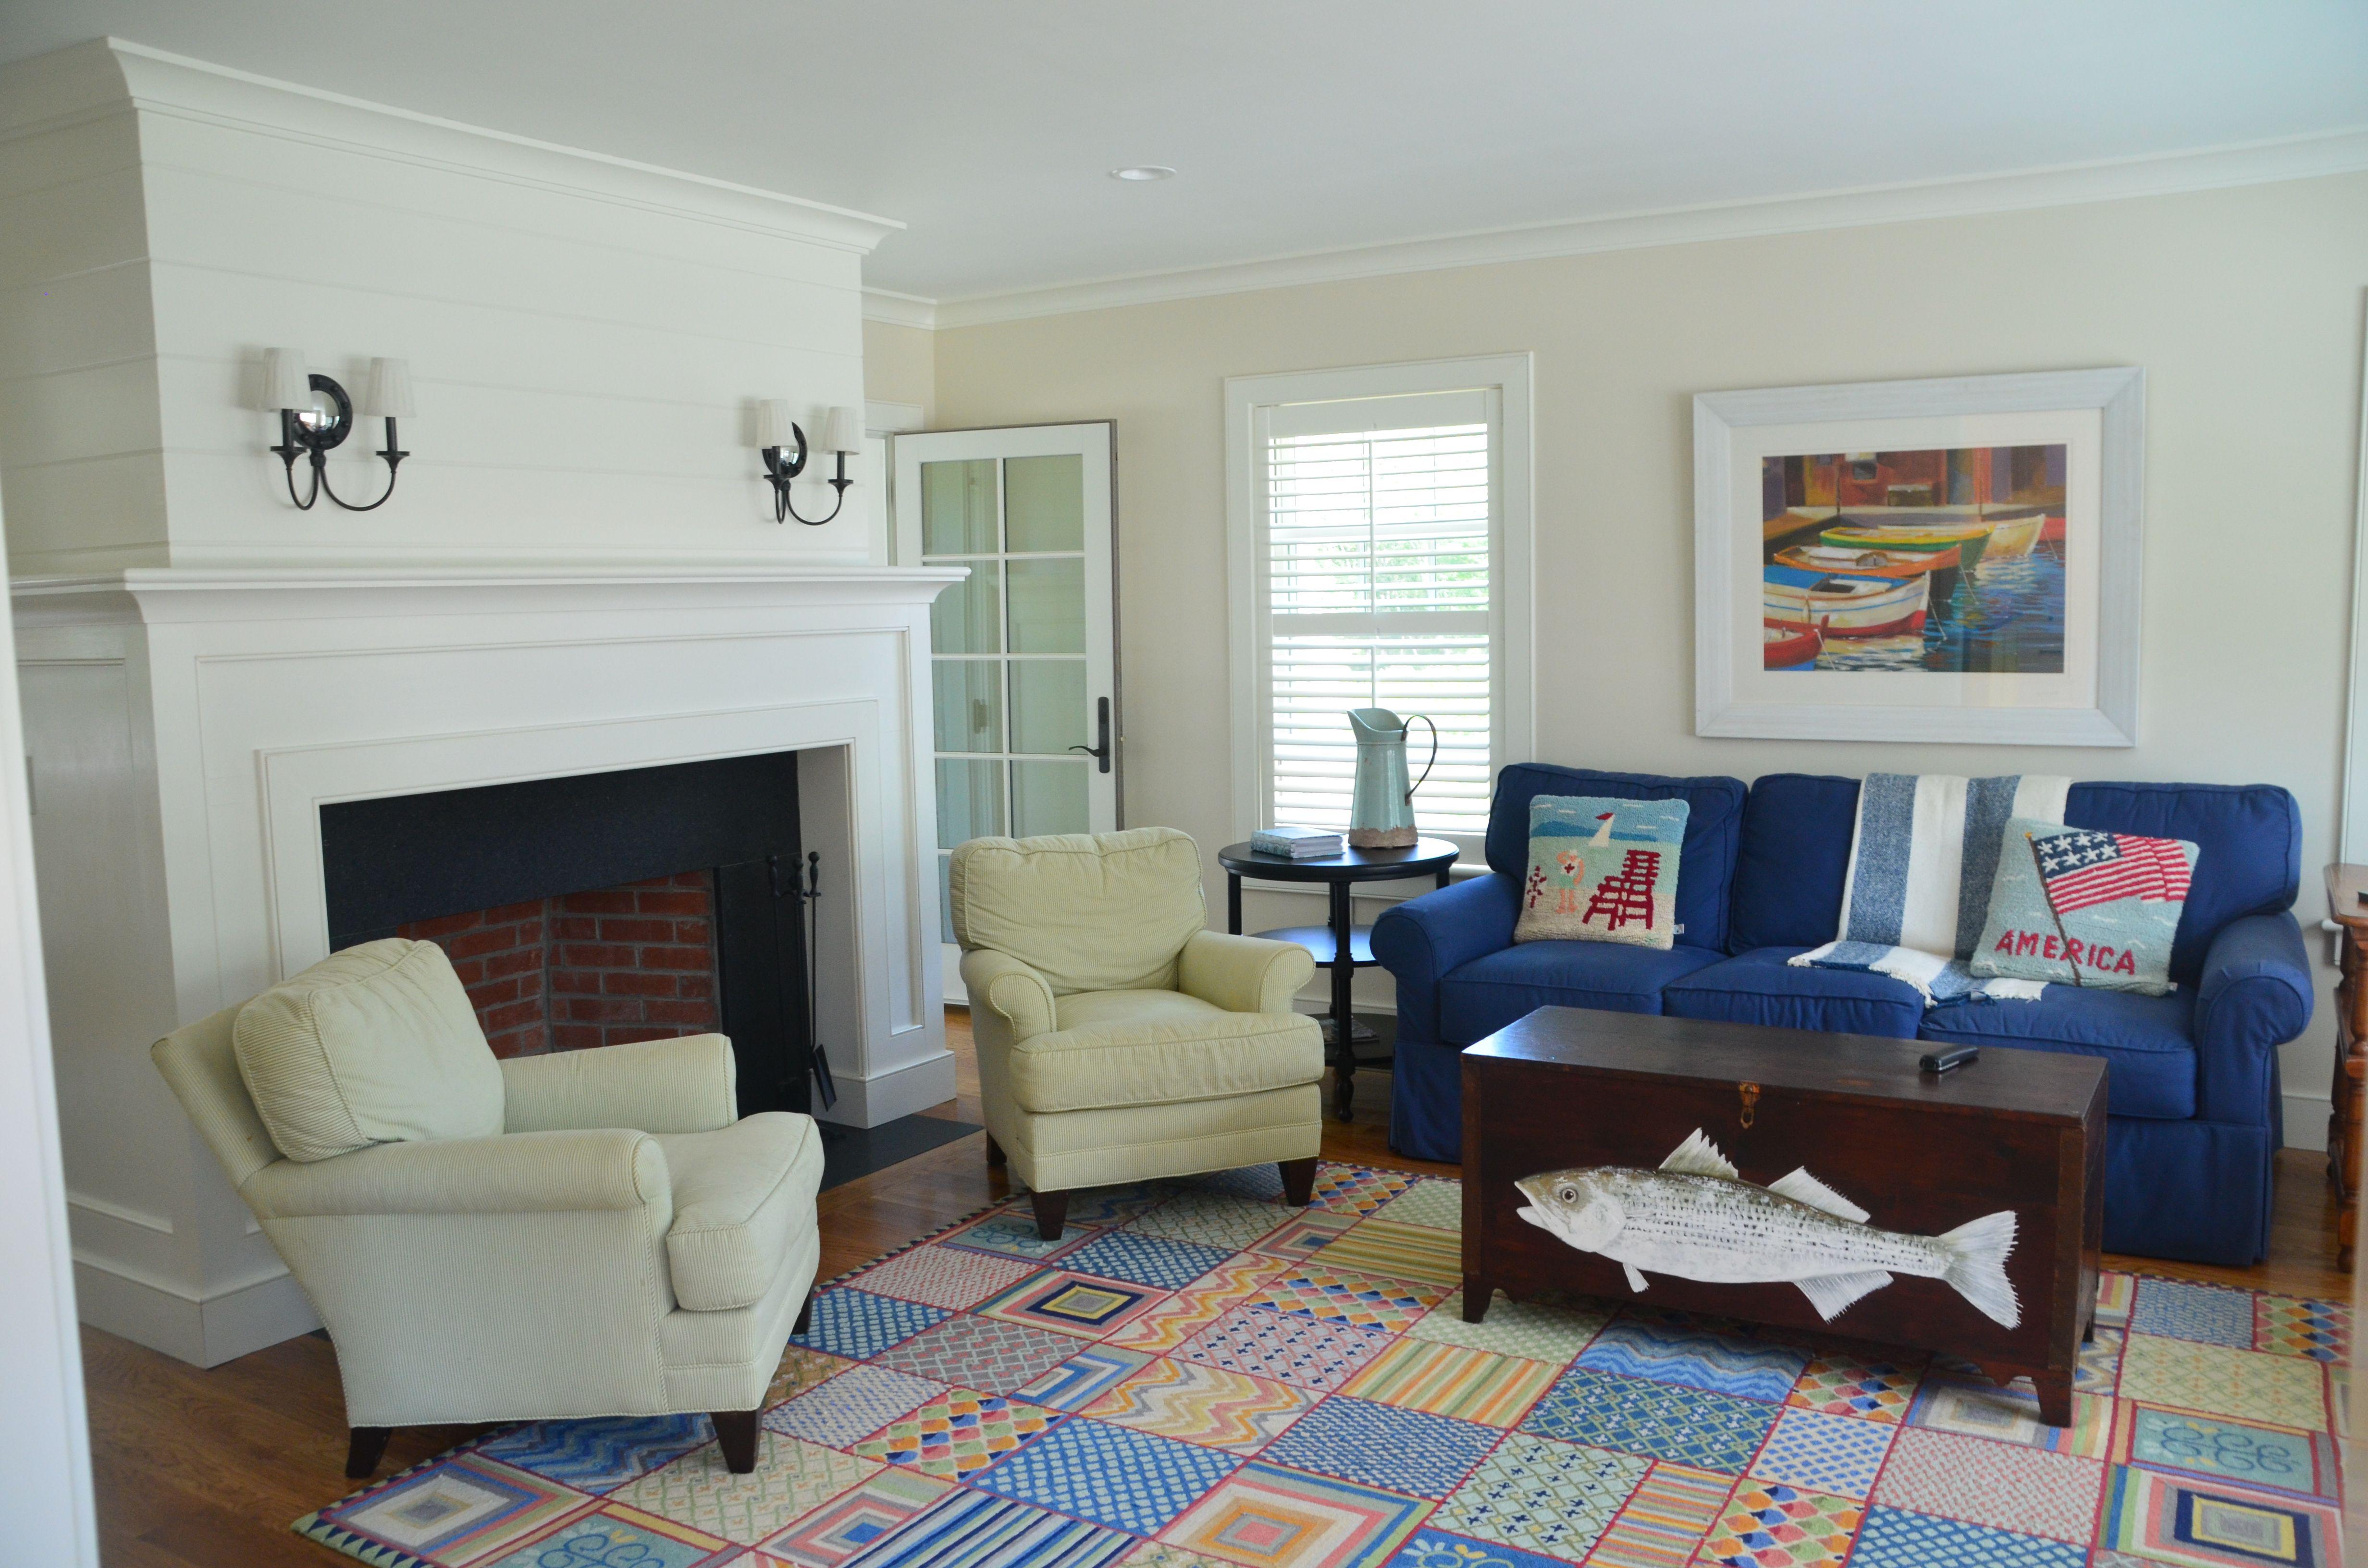 paneled fireplace coastal family room nautical sconces company c rug fish art wide plank. Black Bedroom Furniture Sets. Home Design Ideas